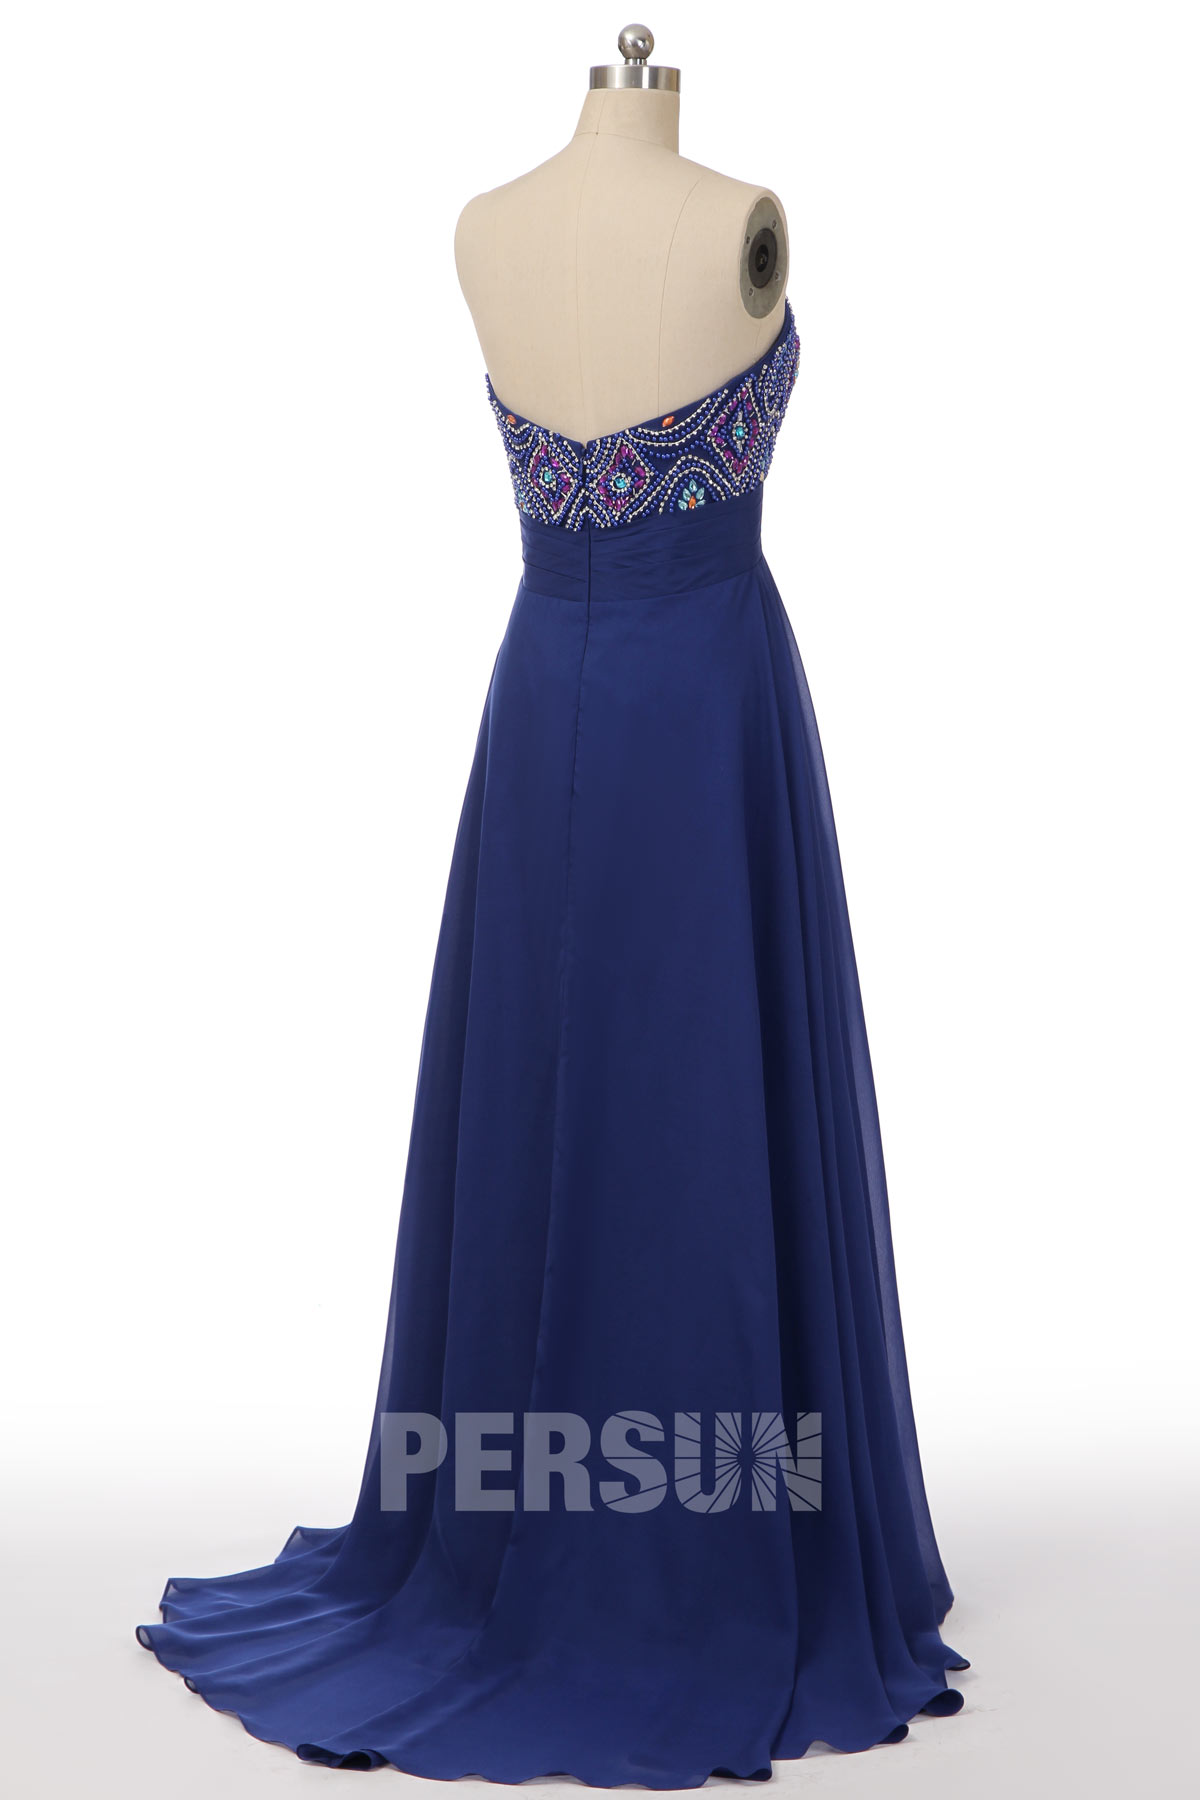 Robe de gala bleu roi longue bustier coeur orné de bijoux style baroque